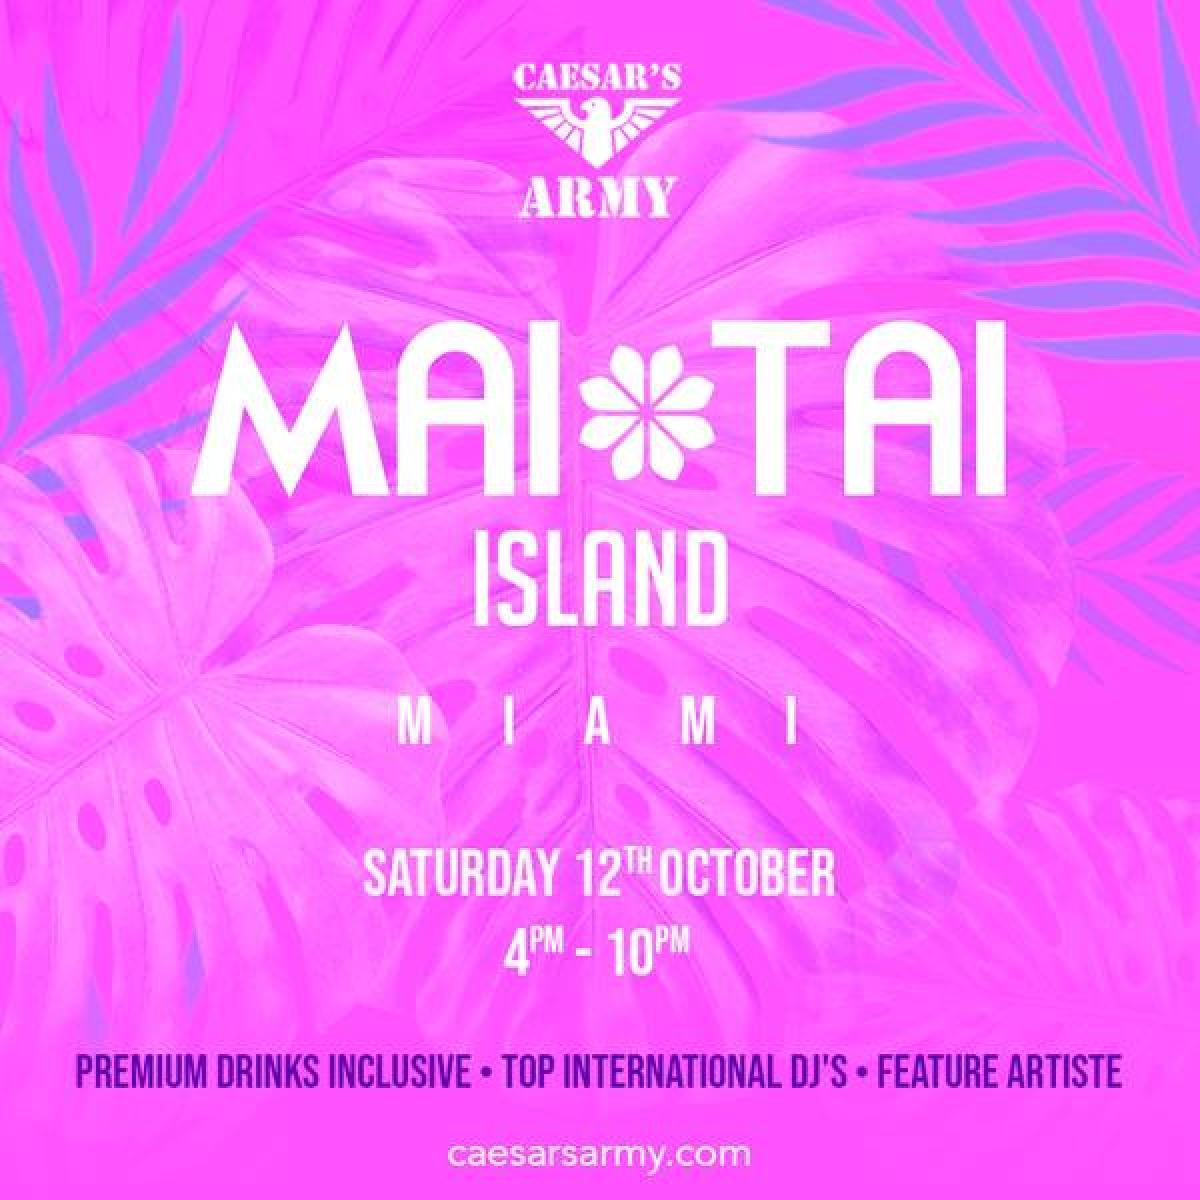 Mai Tai Island flyer or graphic.